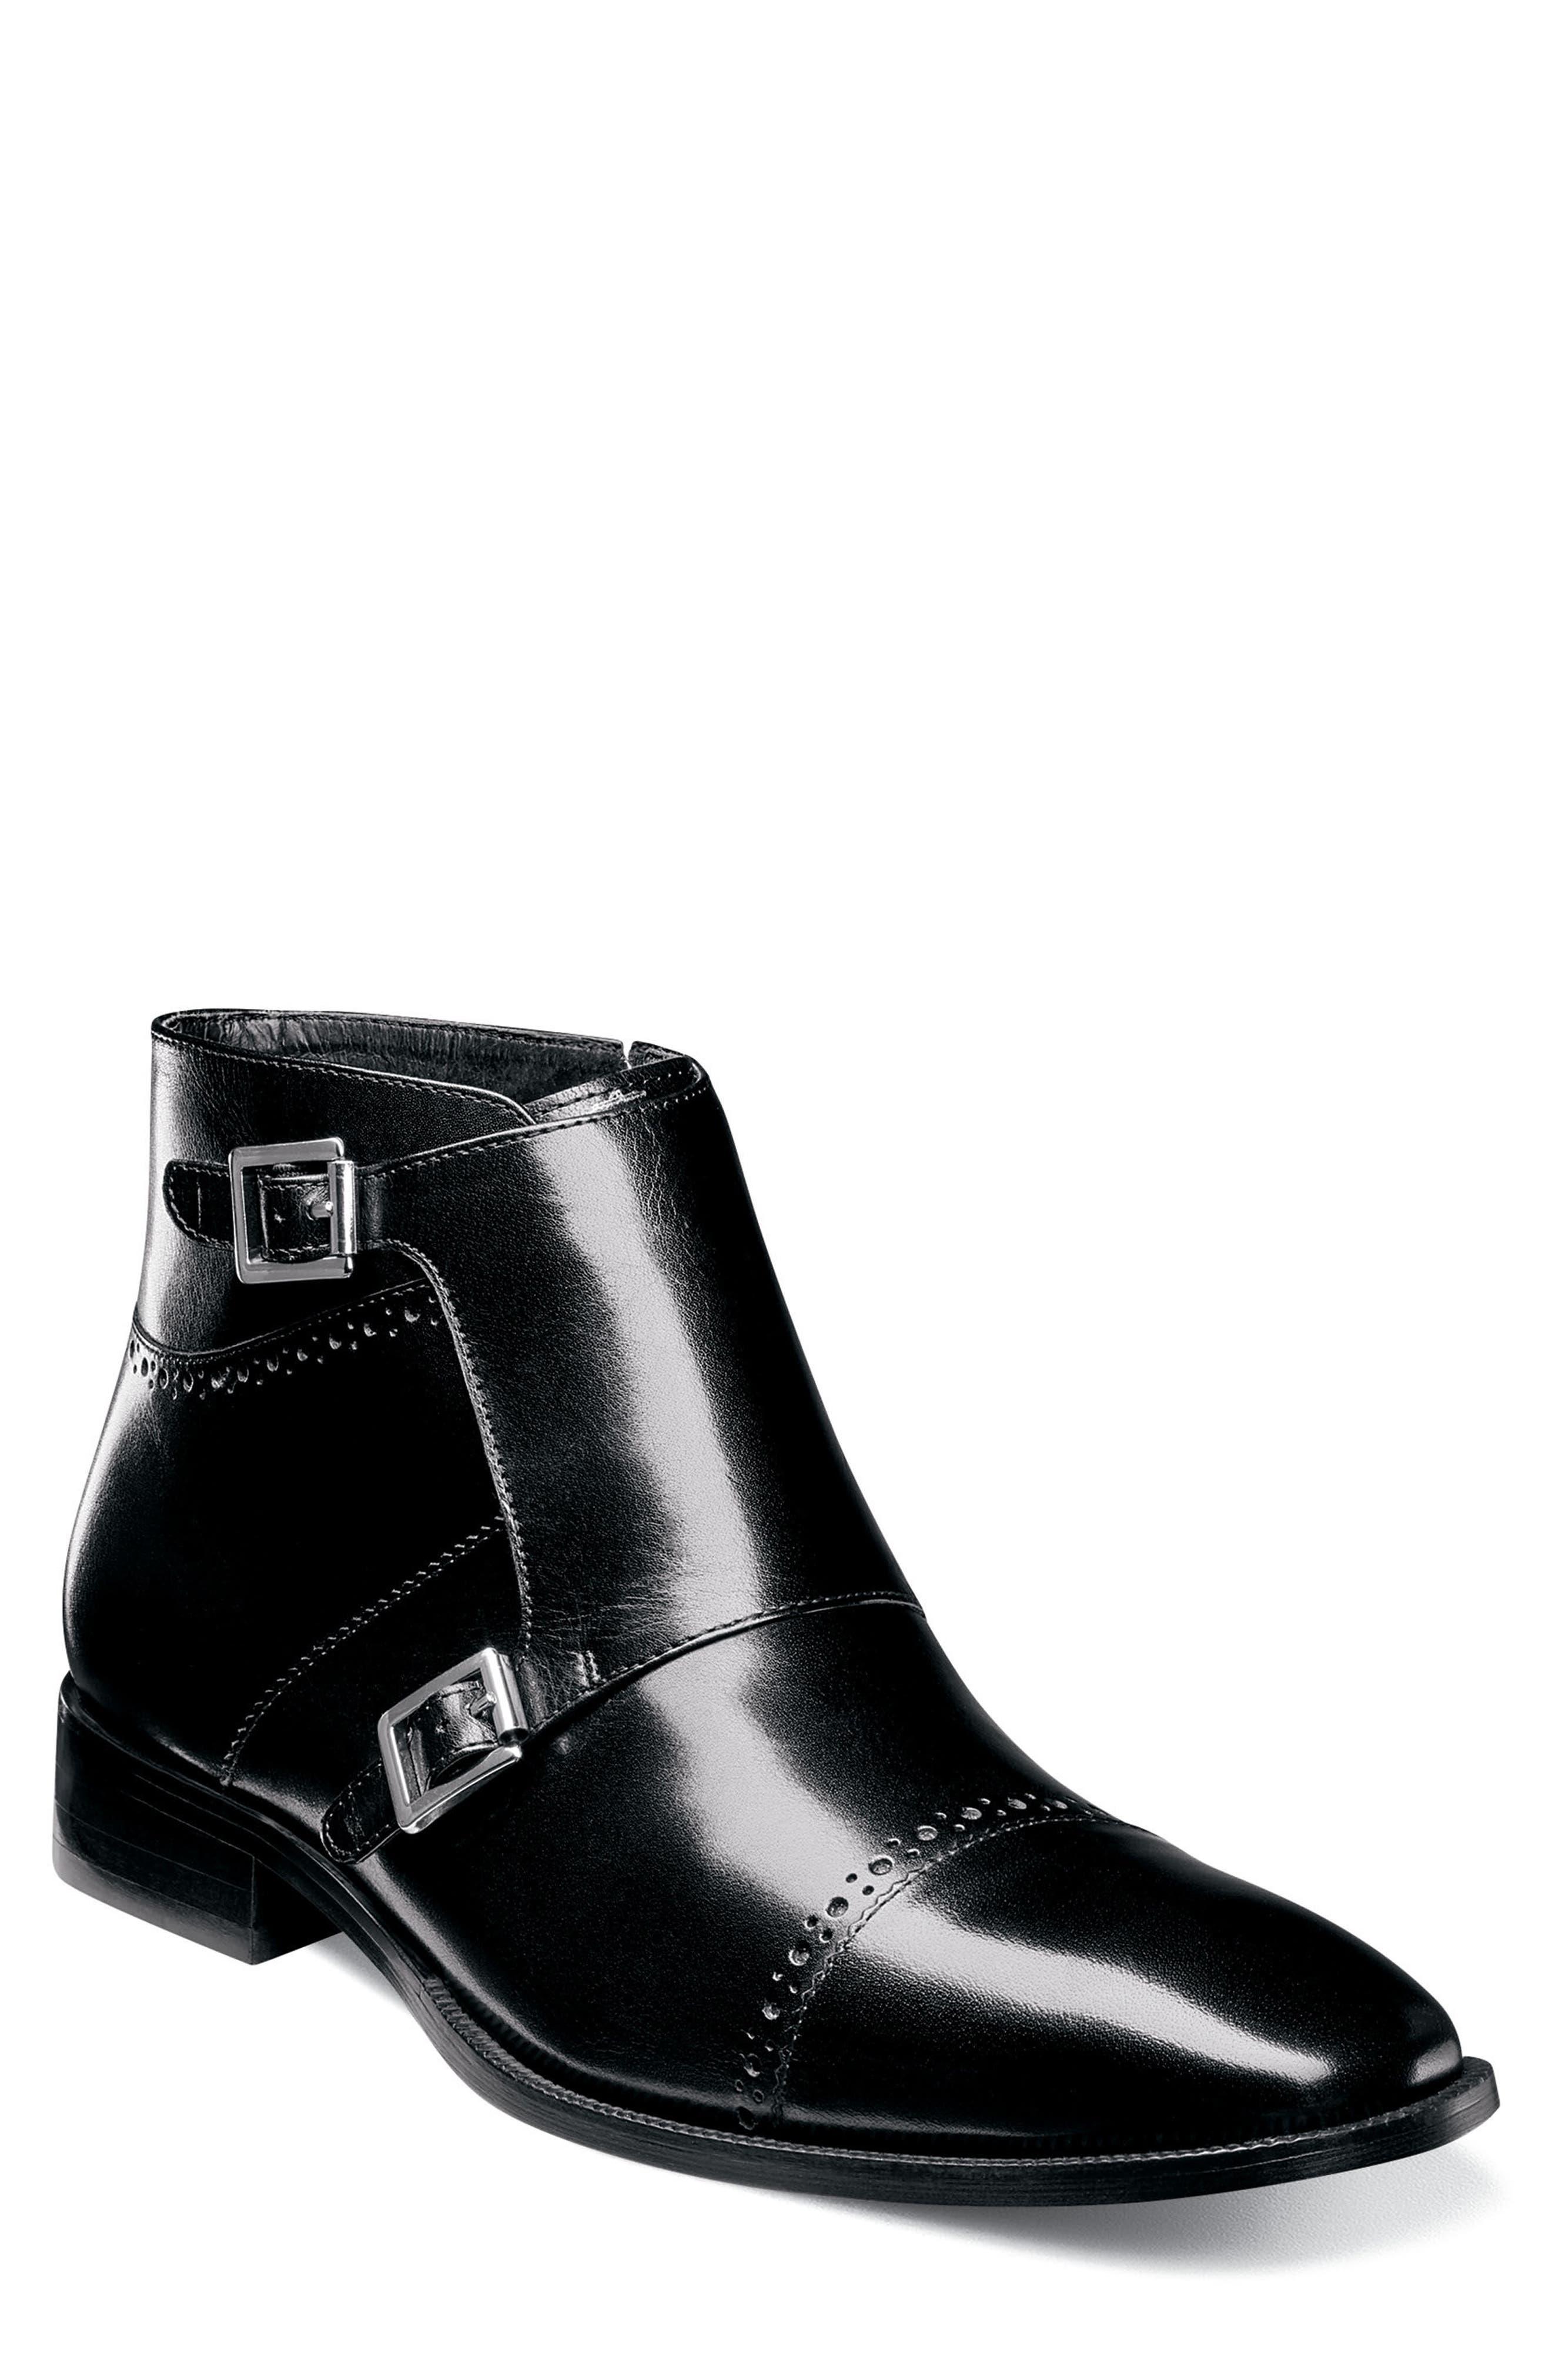 Kason Double Monk Strap Boot,                         Main,                         color, 001